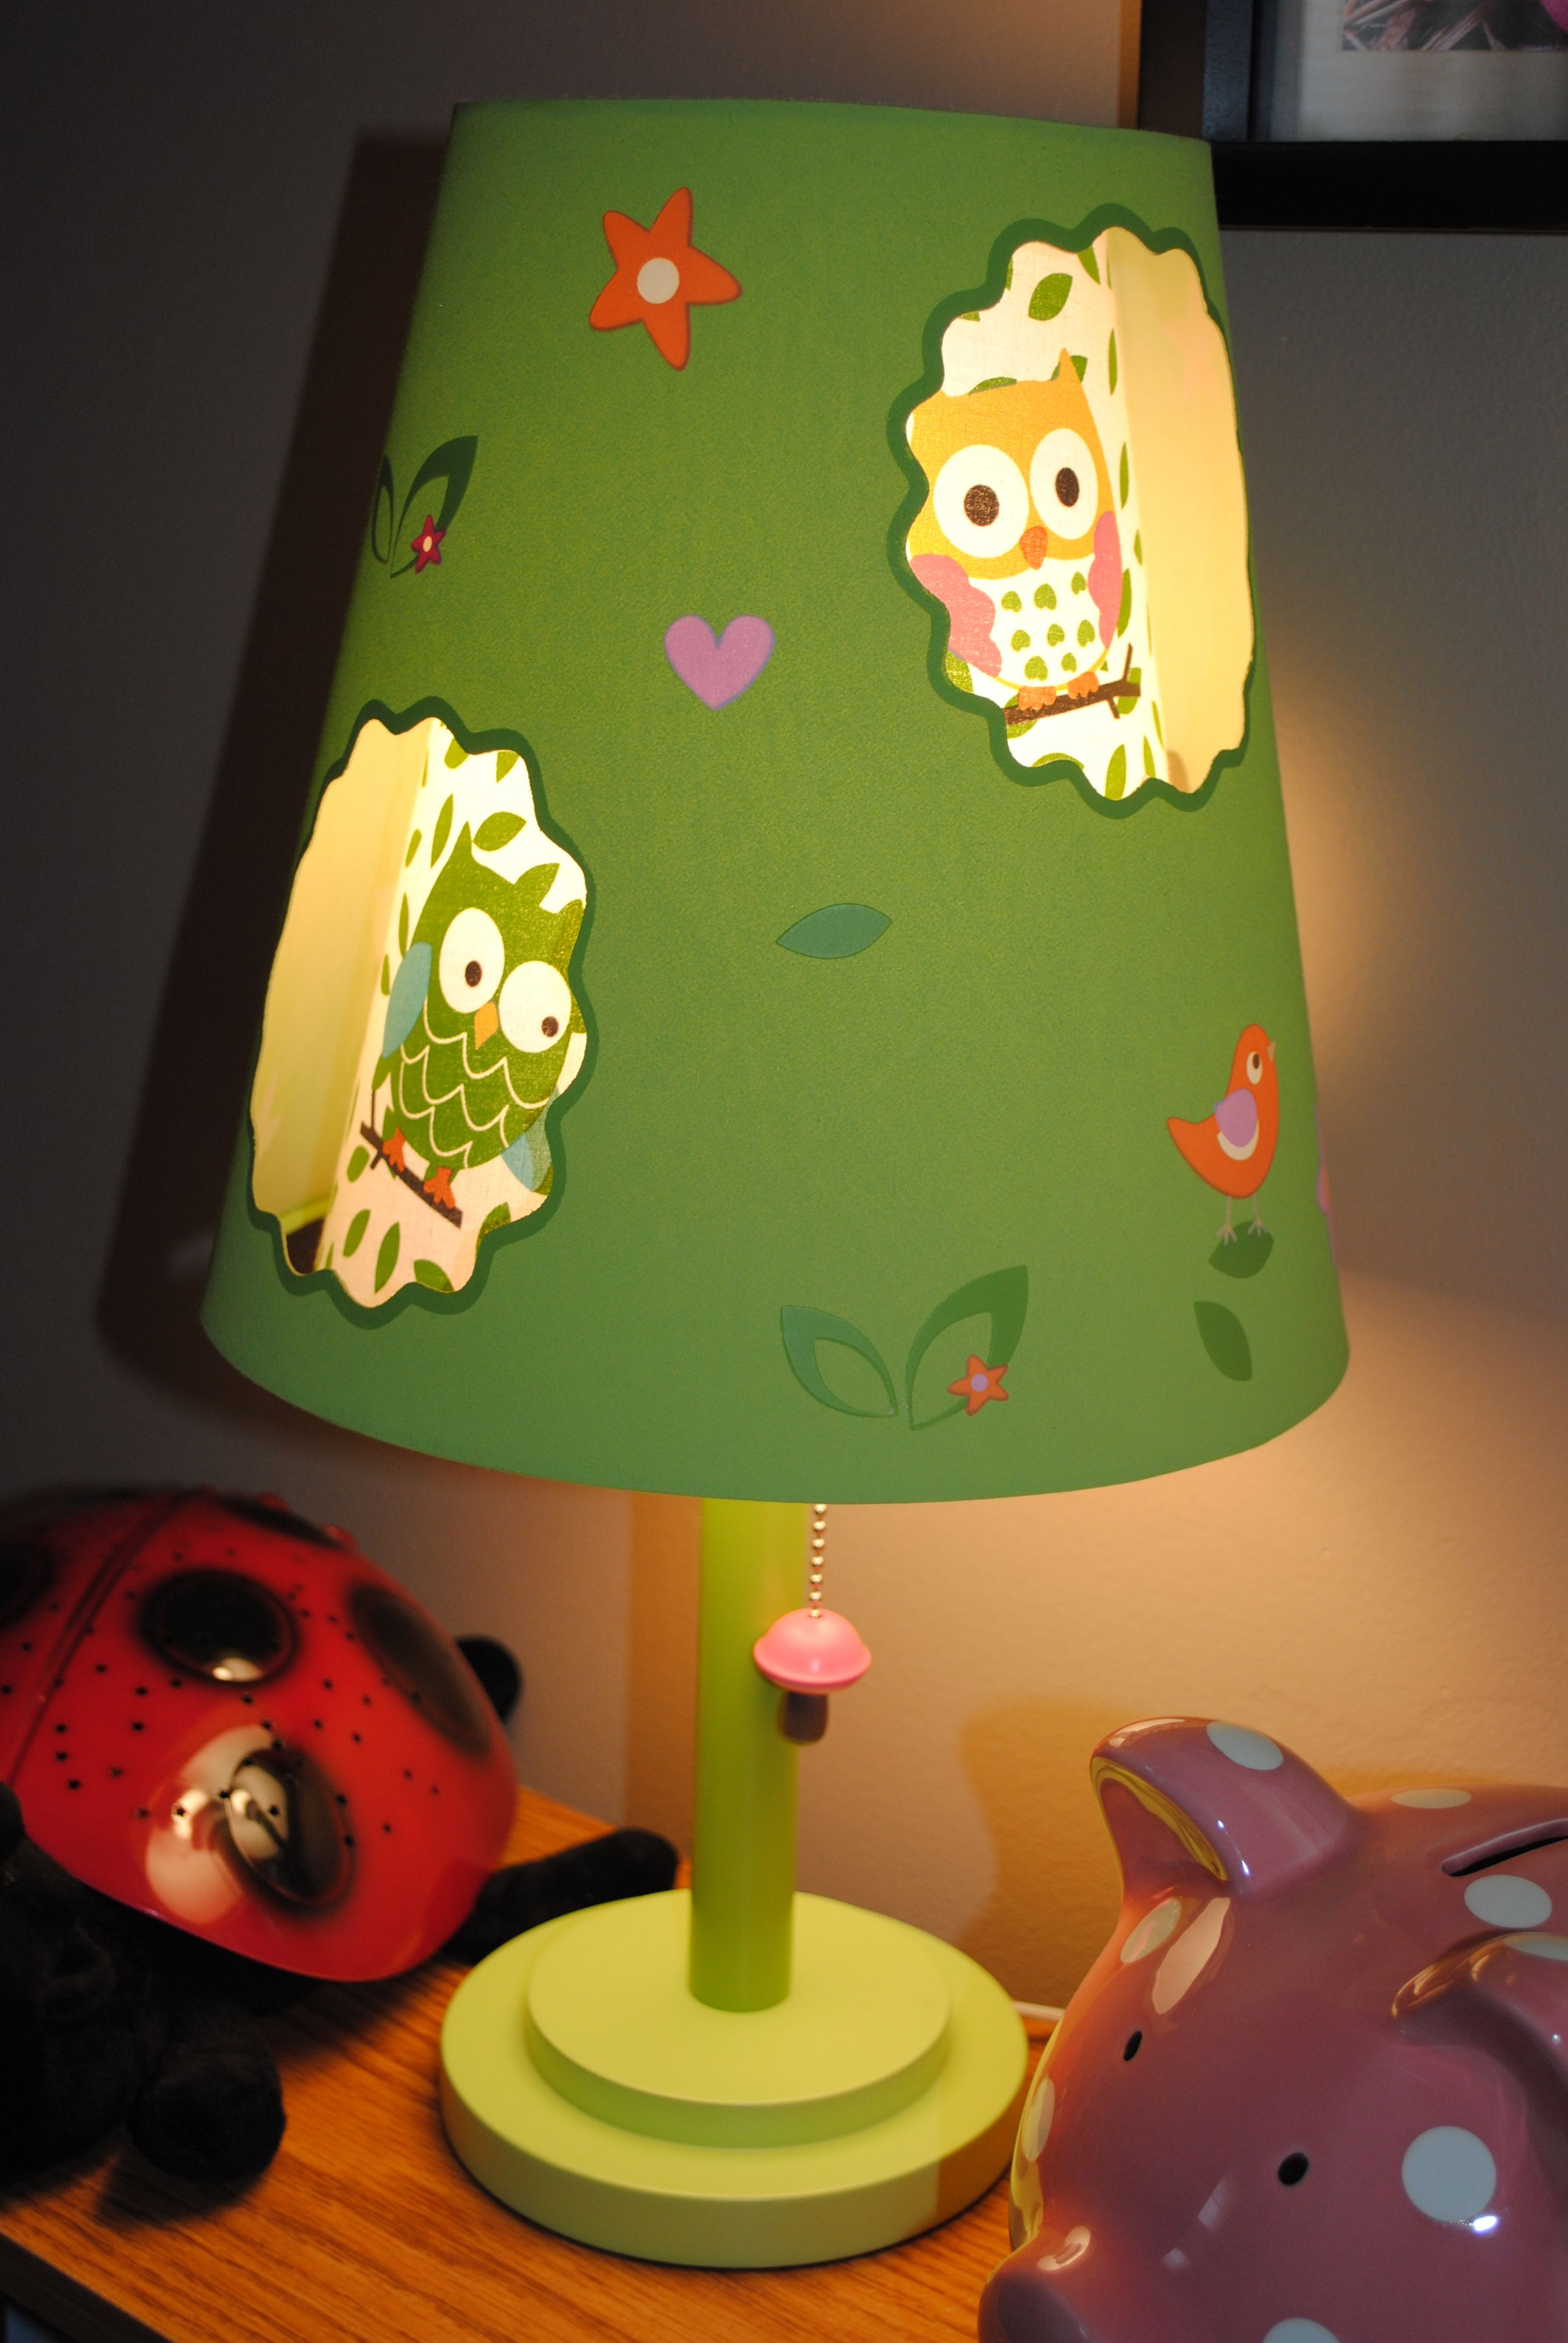 Classroom lamp | Classroom Ideas | Pinterest | Lamps and Classroom